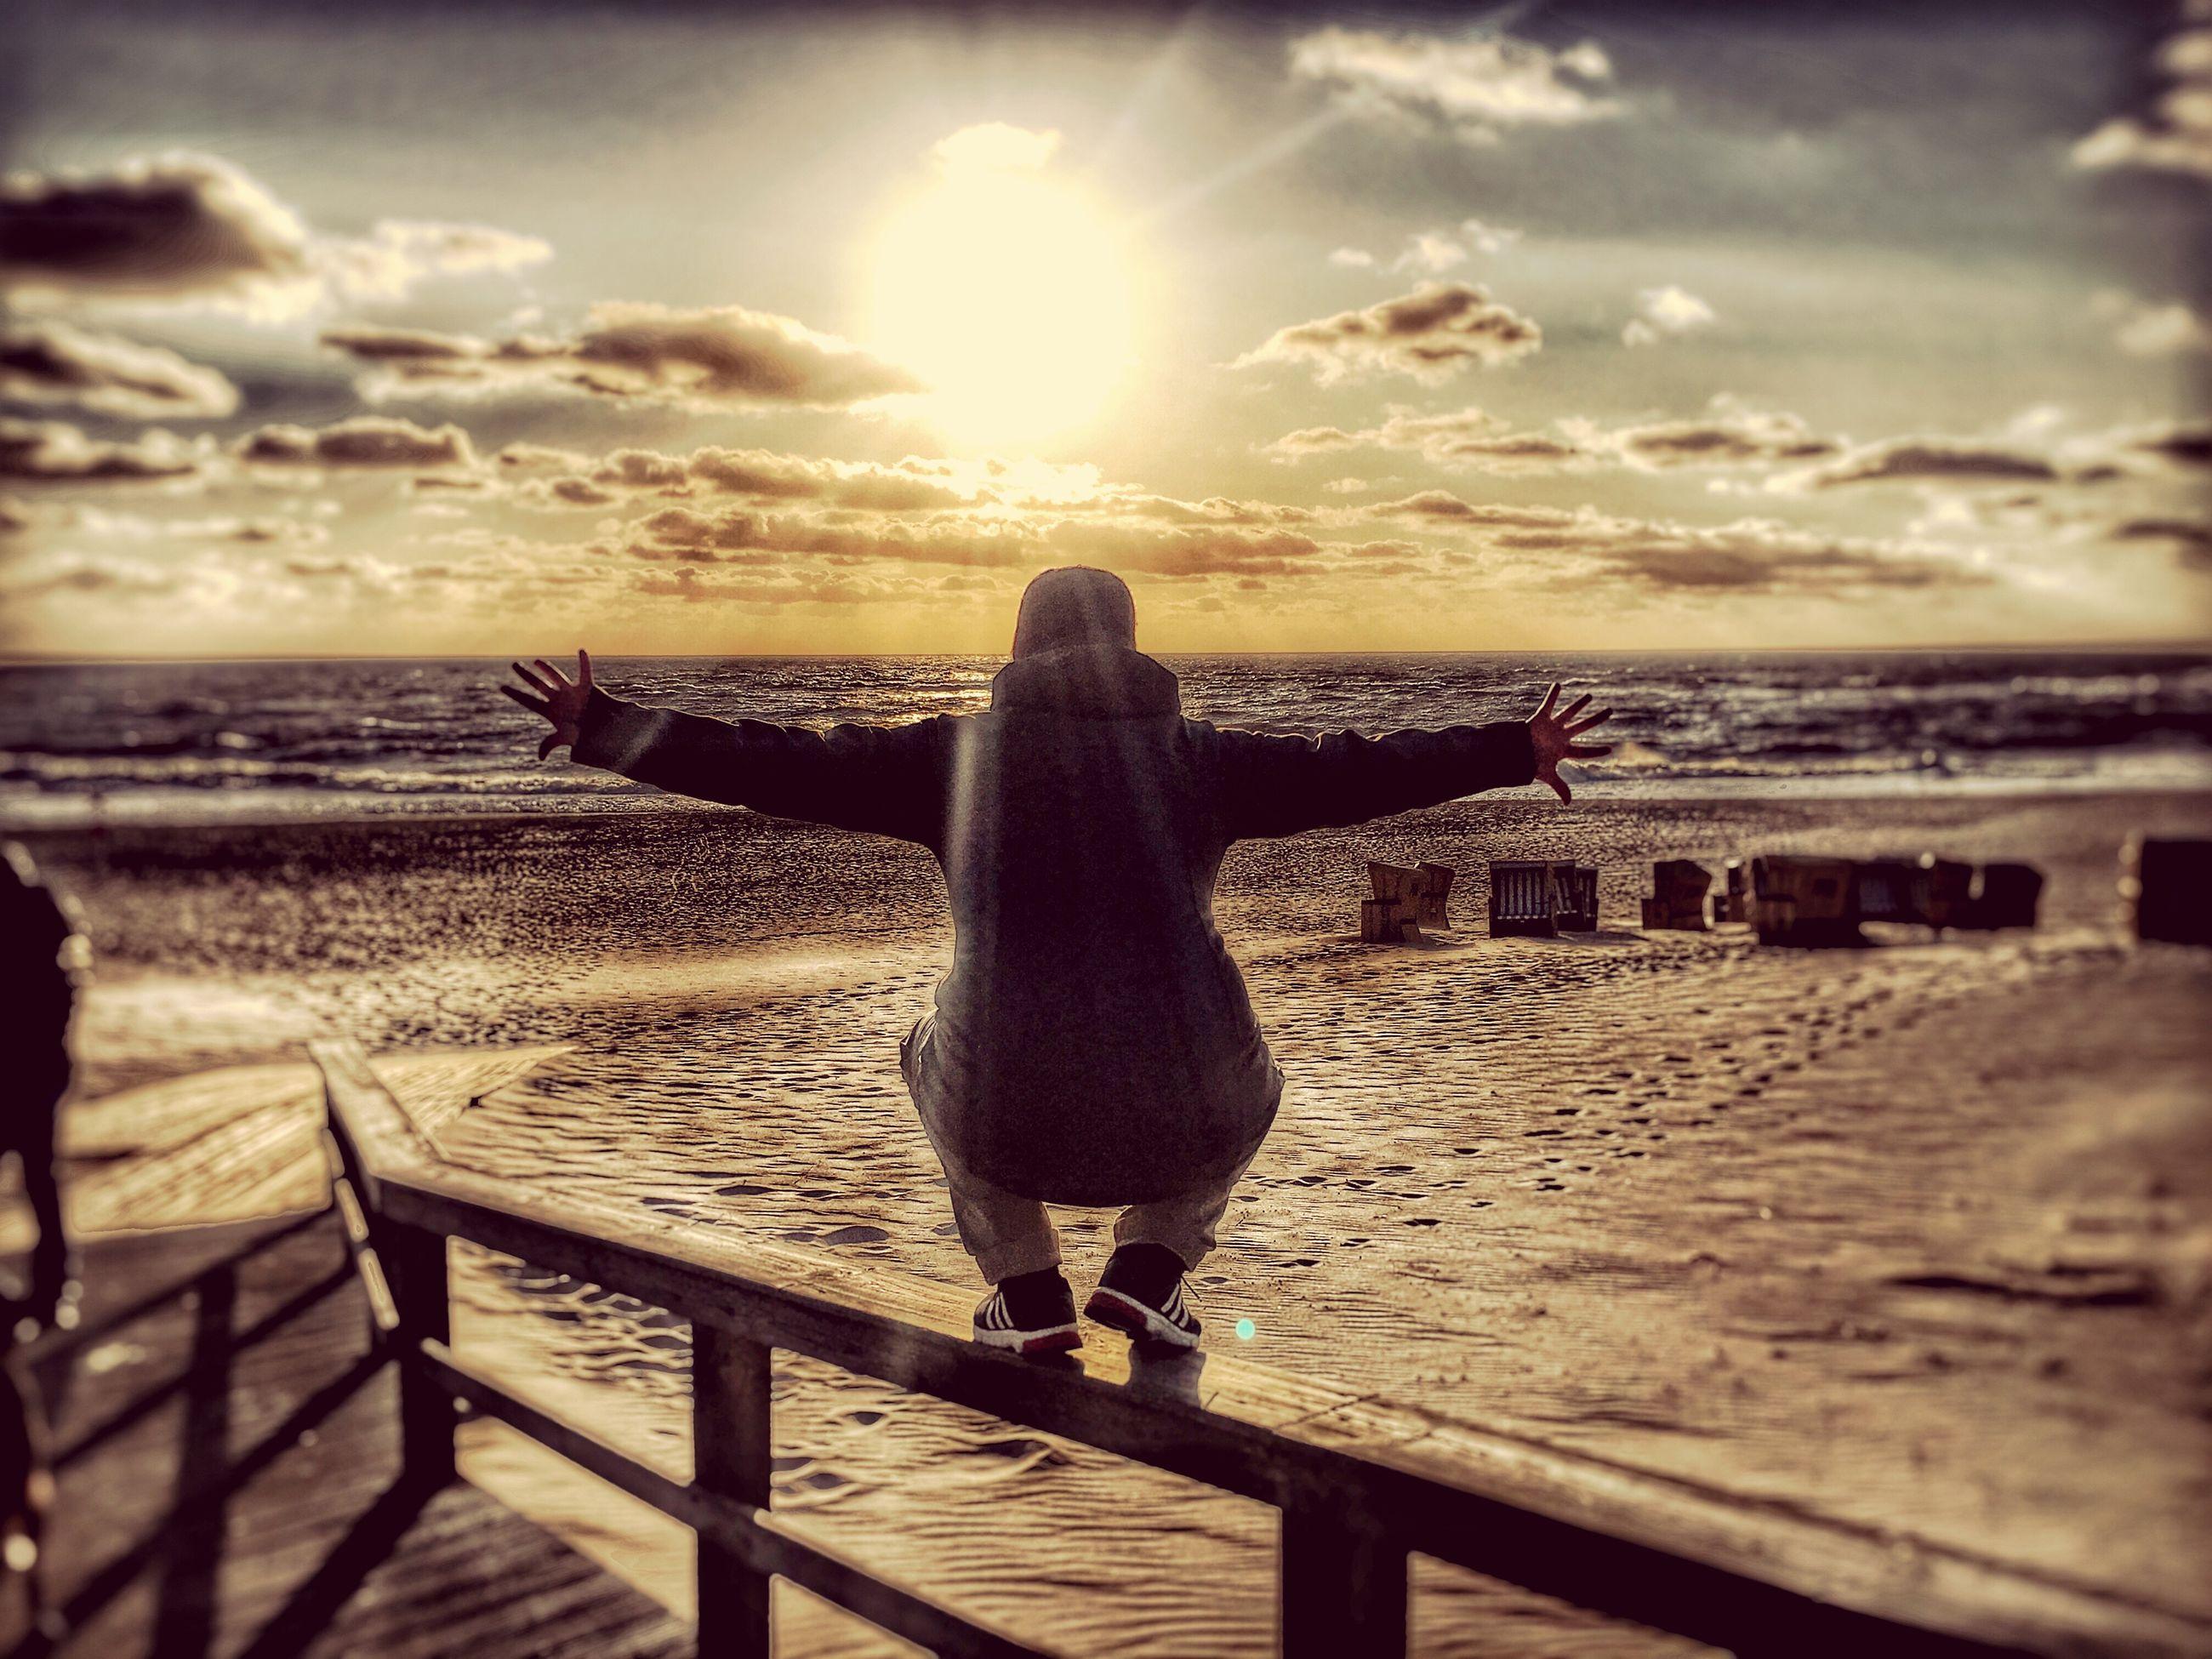 sea, horizon over water, beach, water, sky, sun, sunset, sunlight, shore, sunbeam, scenics, cloud - sky, tranquil scene, tranquility, beauty in nature, nature, sand, lens flare, idyllic